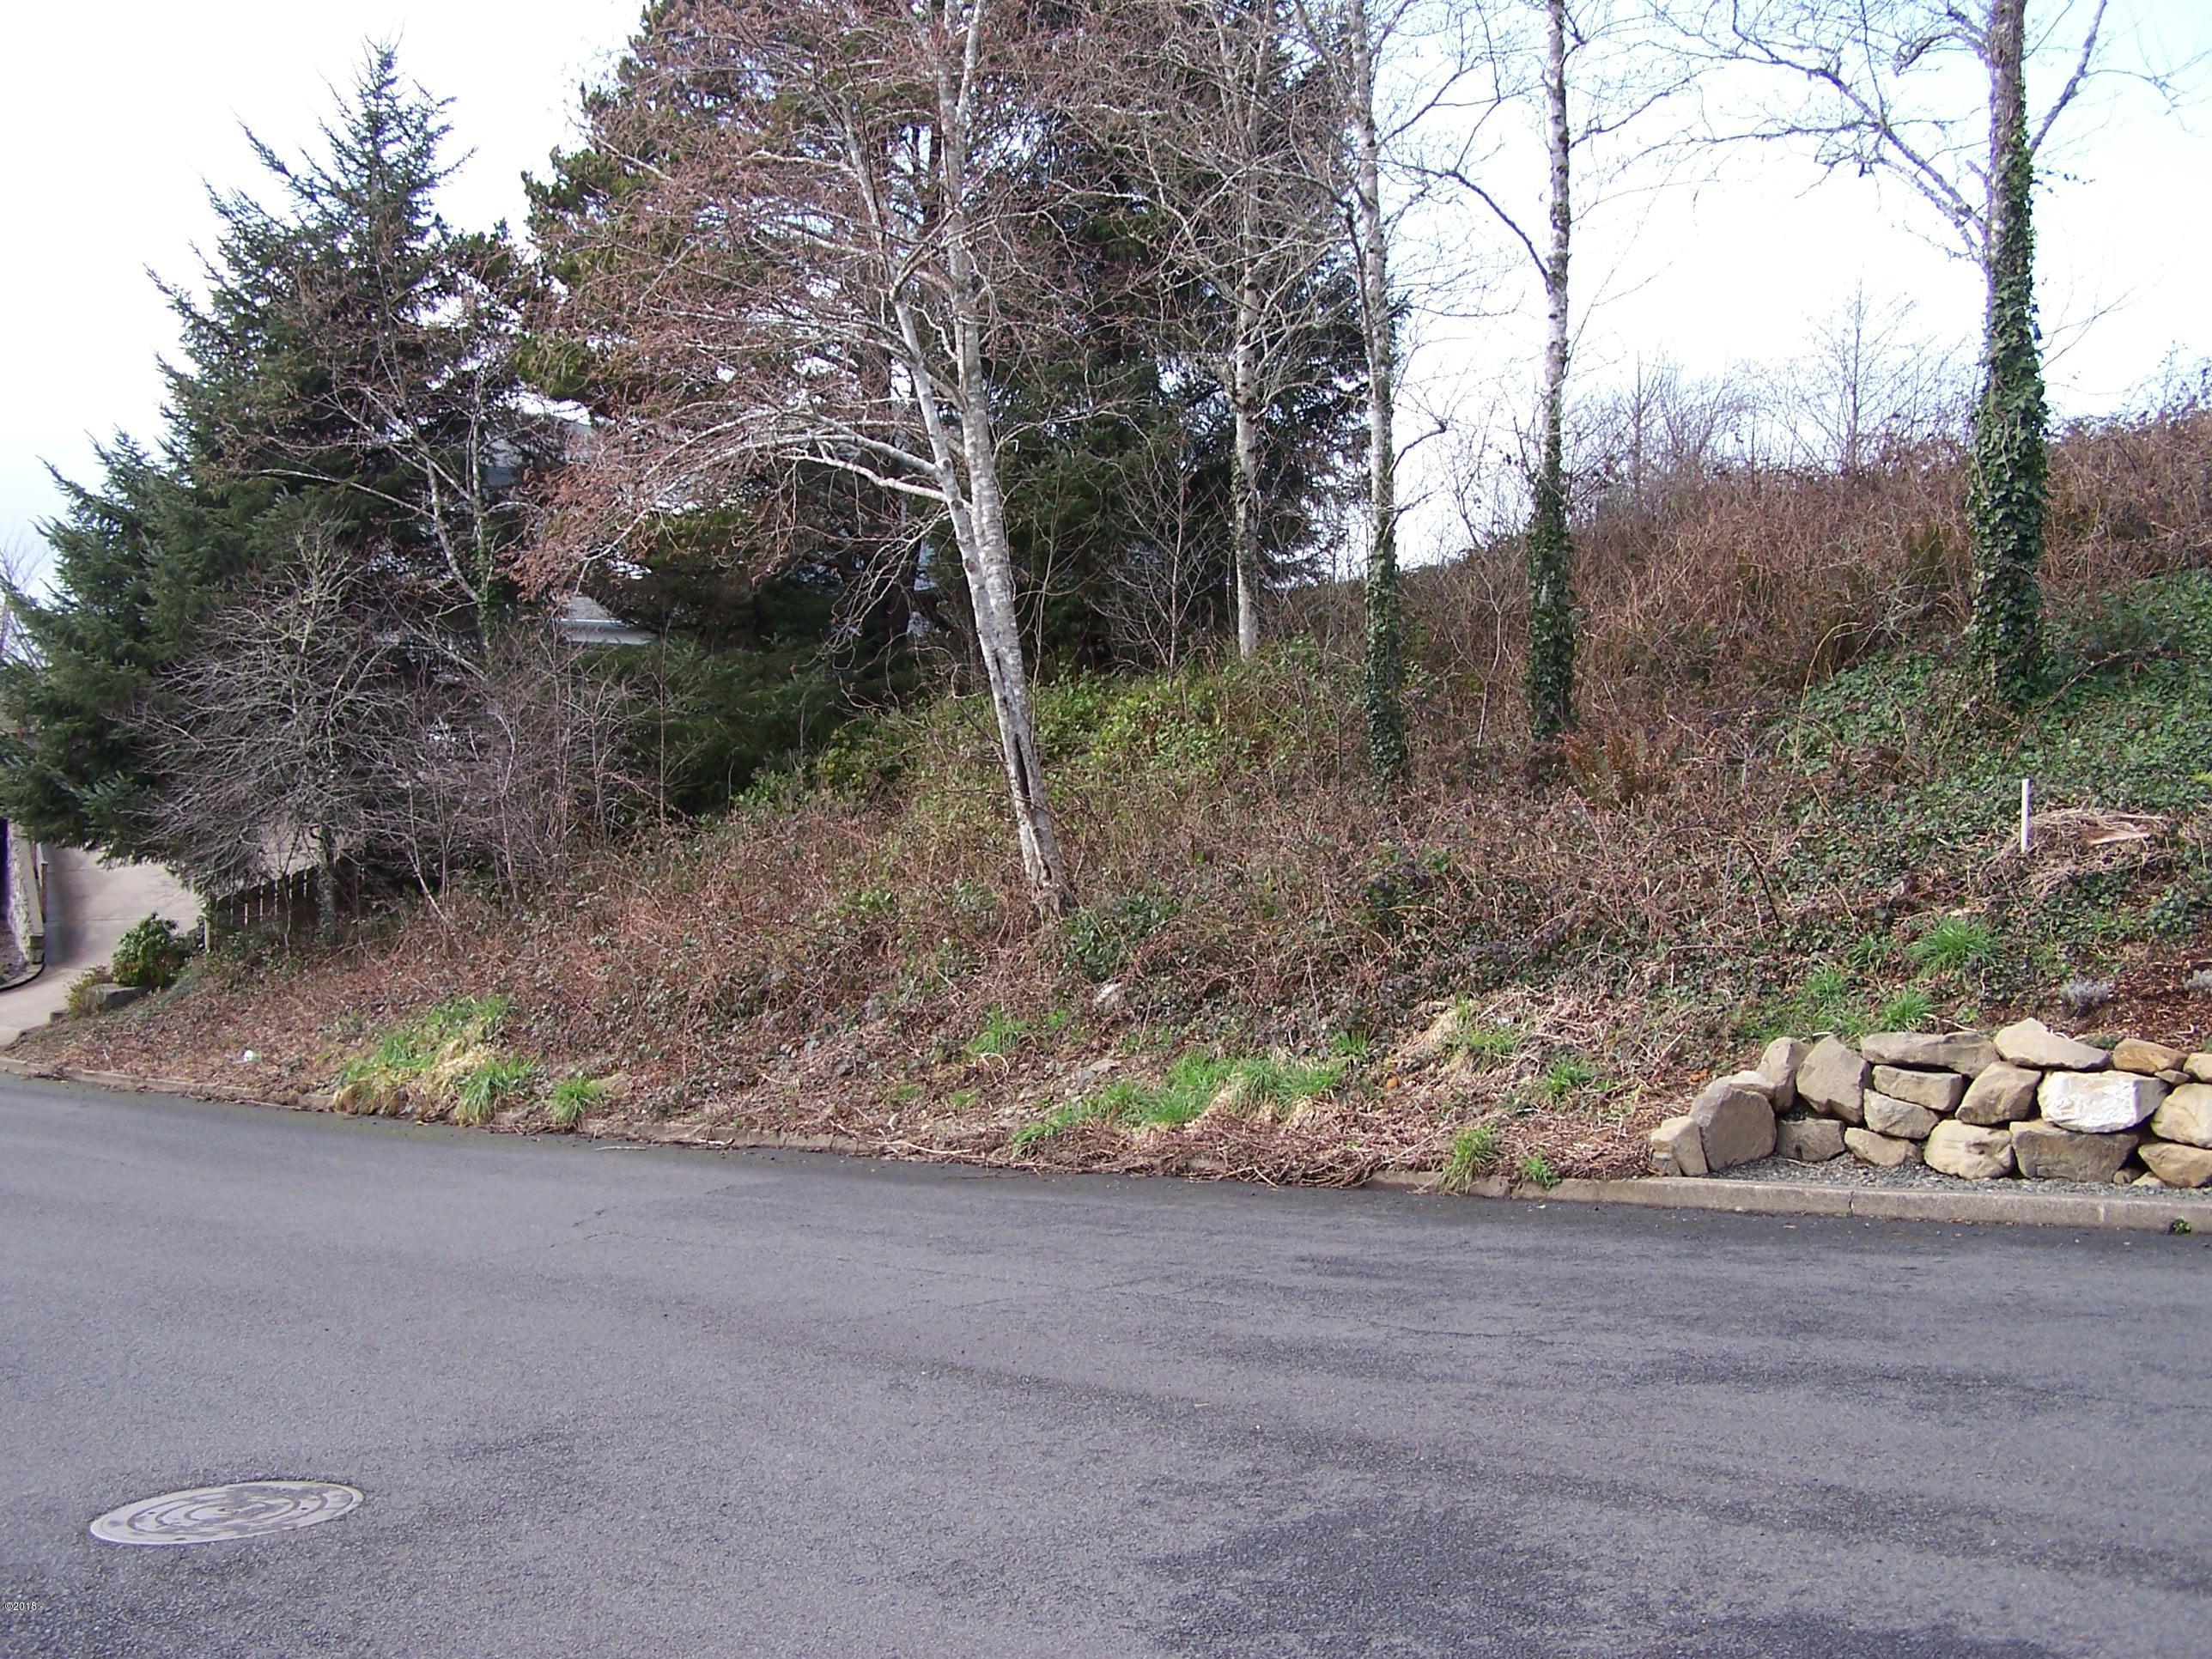 TL4100 NE 7th, Newport, OR 97365 - street level